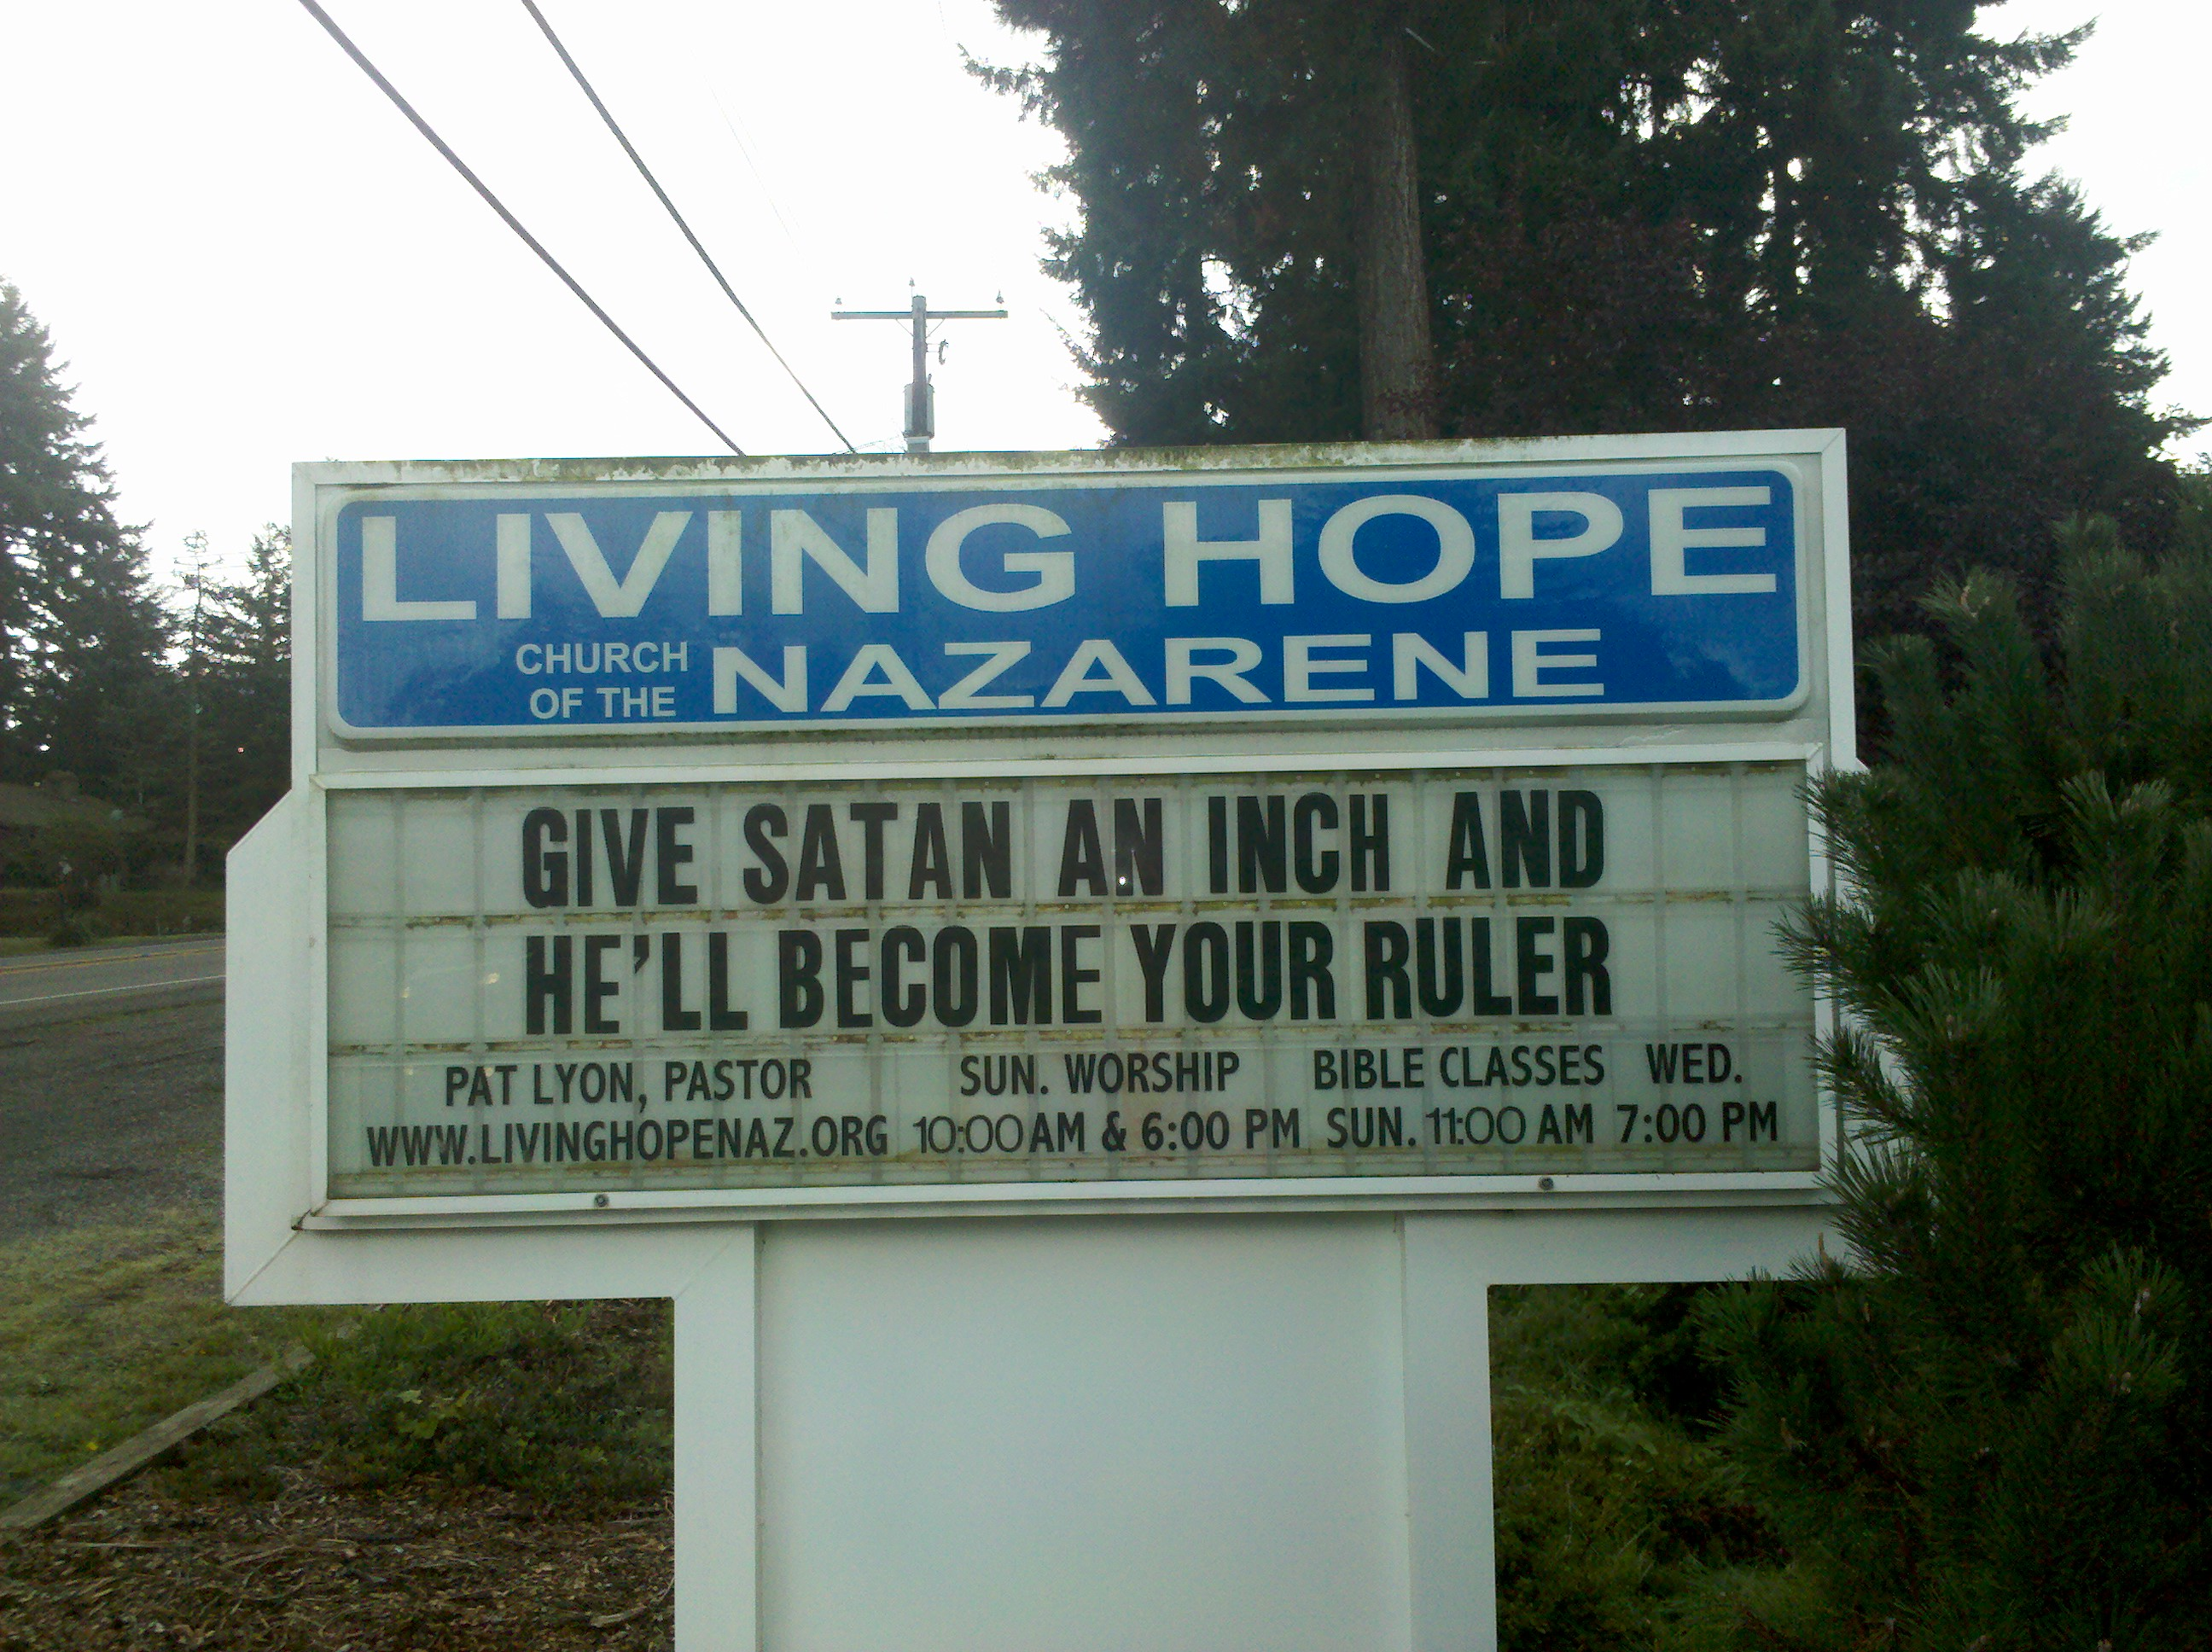 Church Sign Quotes Google Image Result For Httpsimuleustisetpecator.files